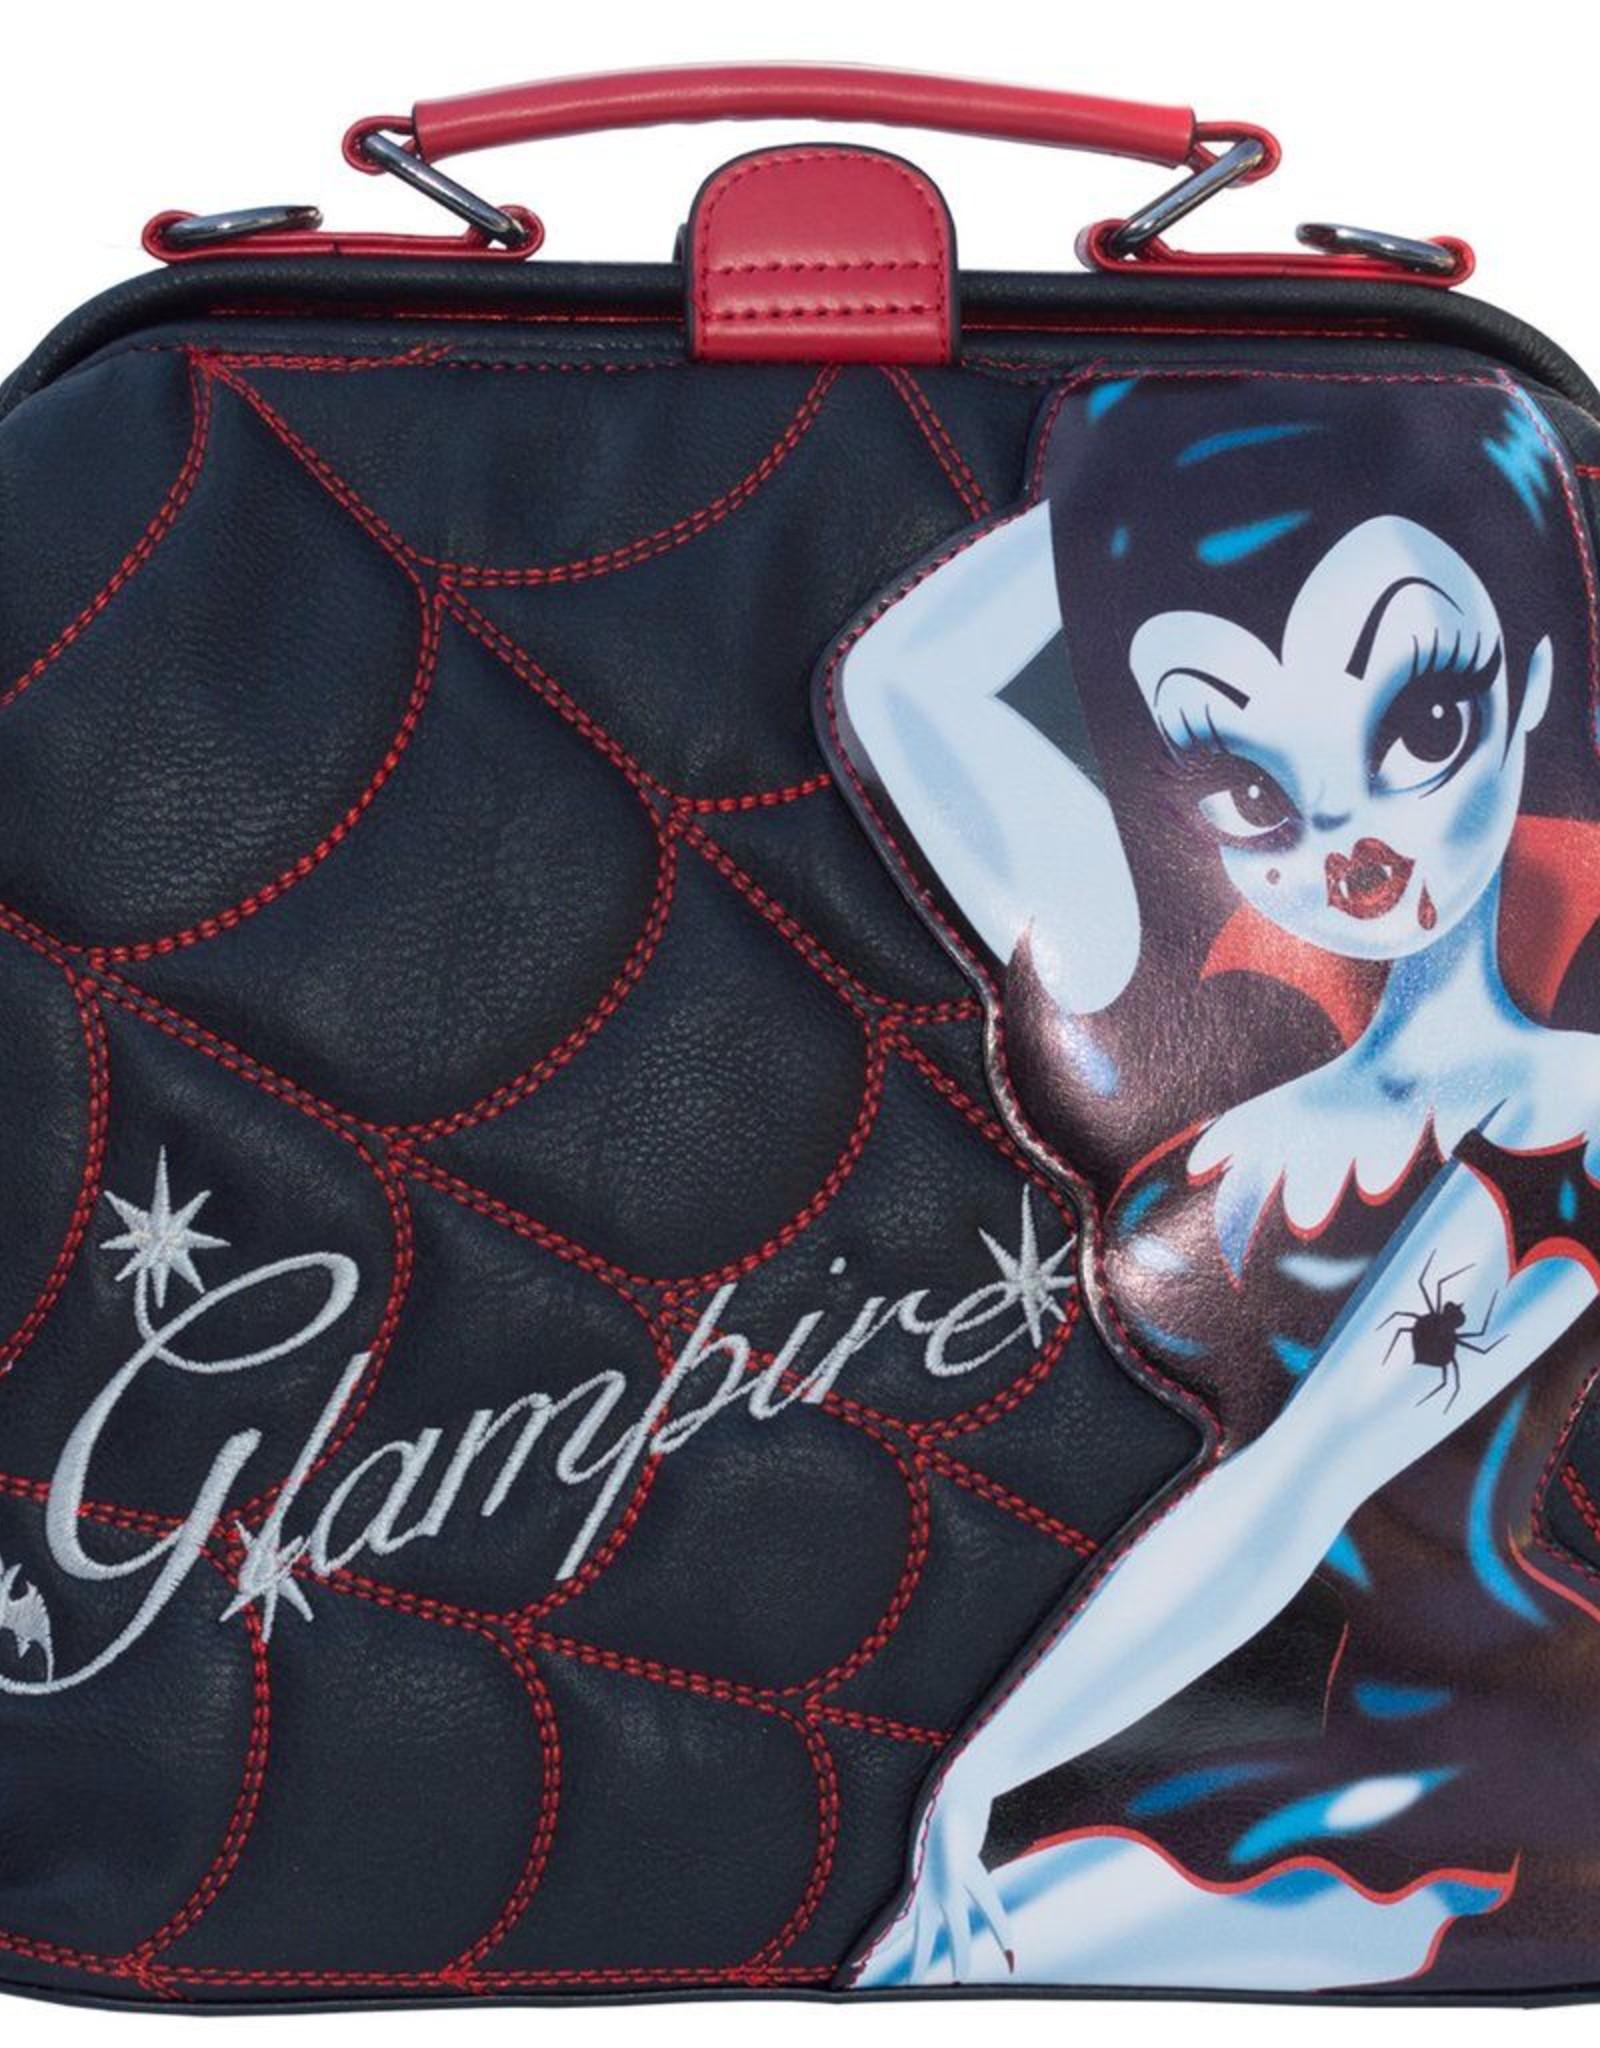 Glampire Doctor's Bag